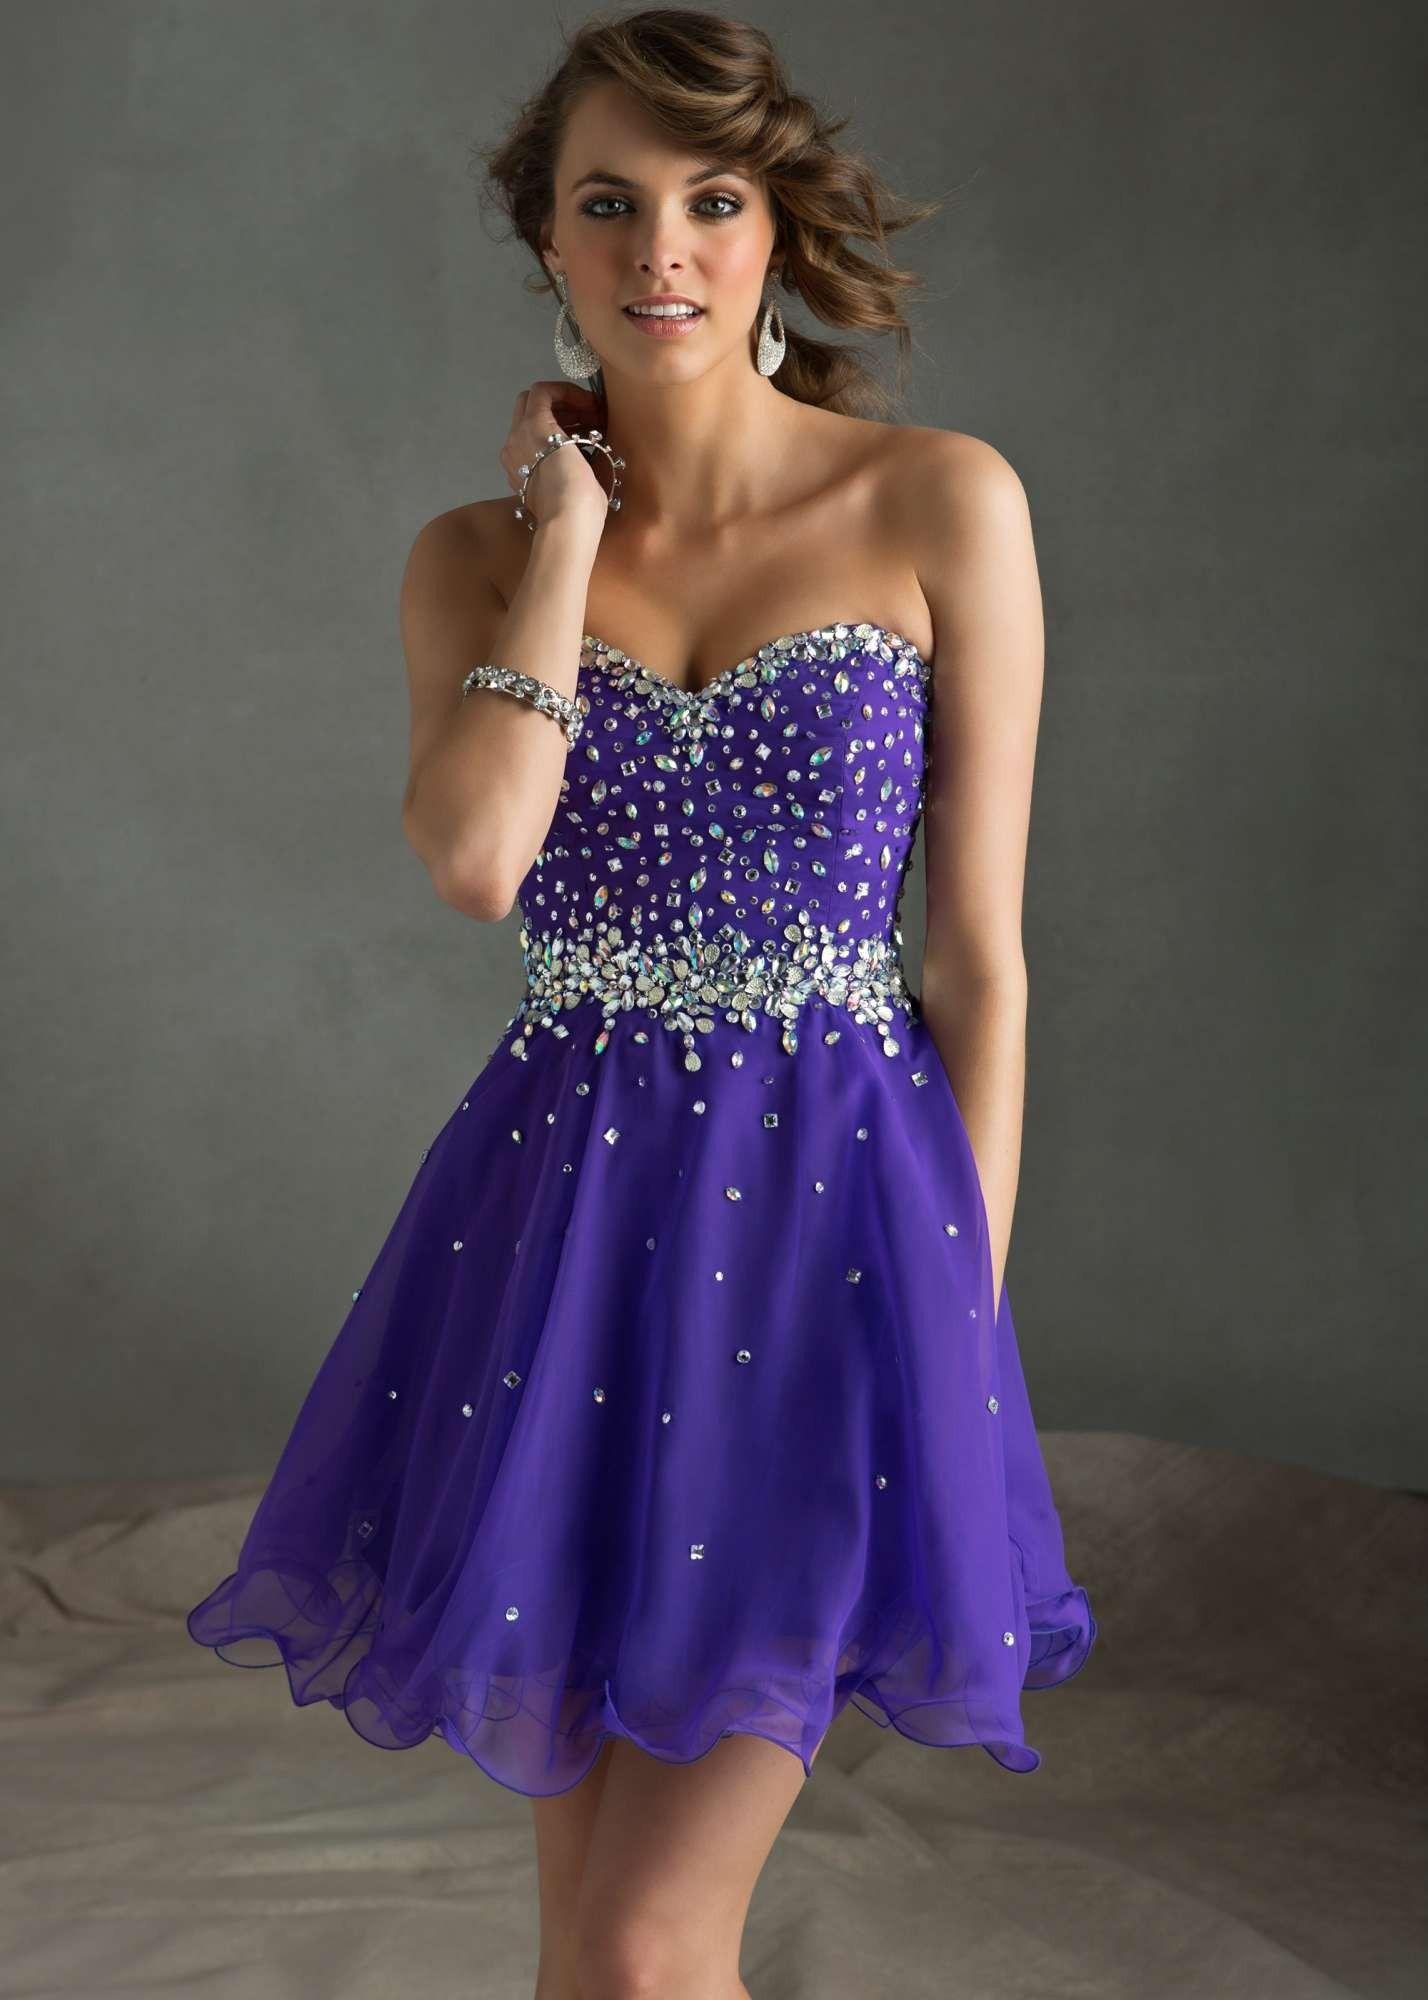 Sticks & Stones by Mori Lee 9240 Flirty Purple Chiffon Dress ...